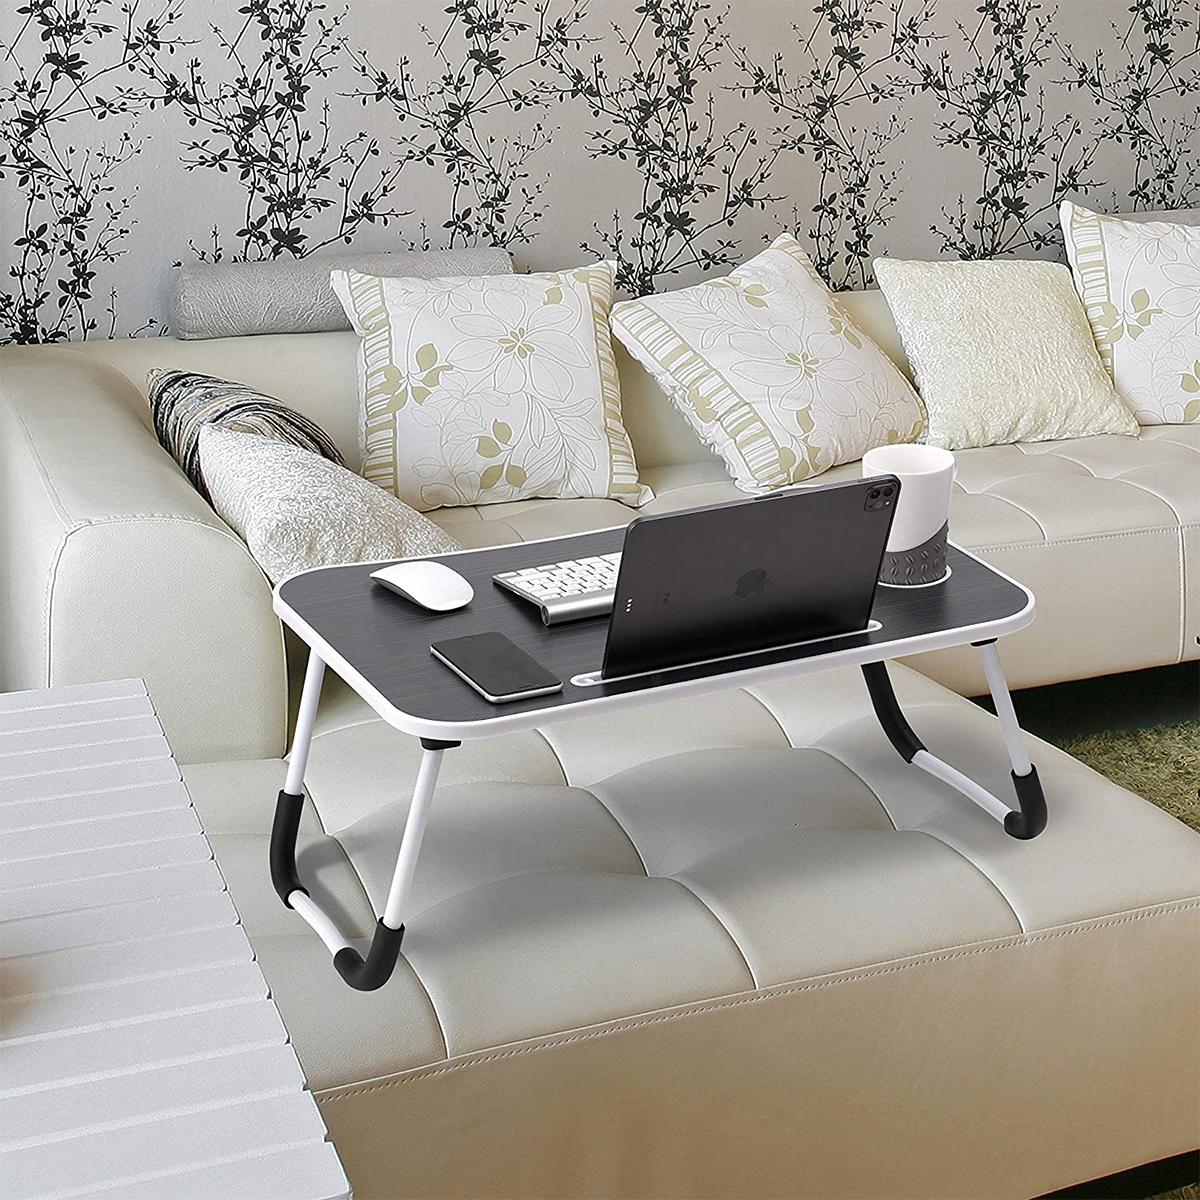 hs05 portatþif katlanabilir laptop sehpasý siyah beyaz